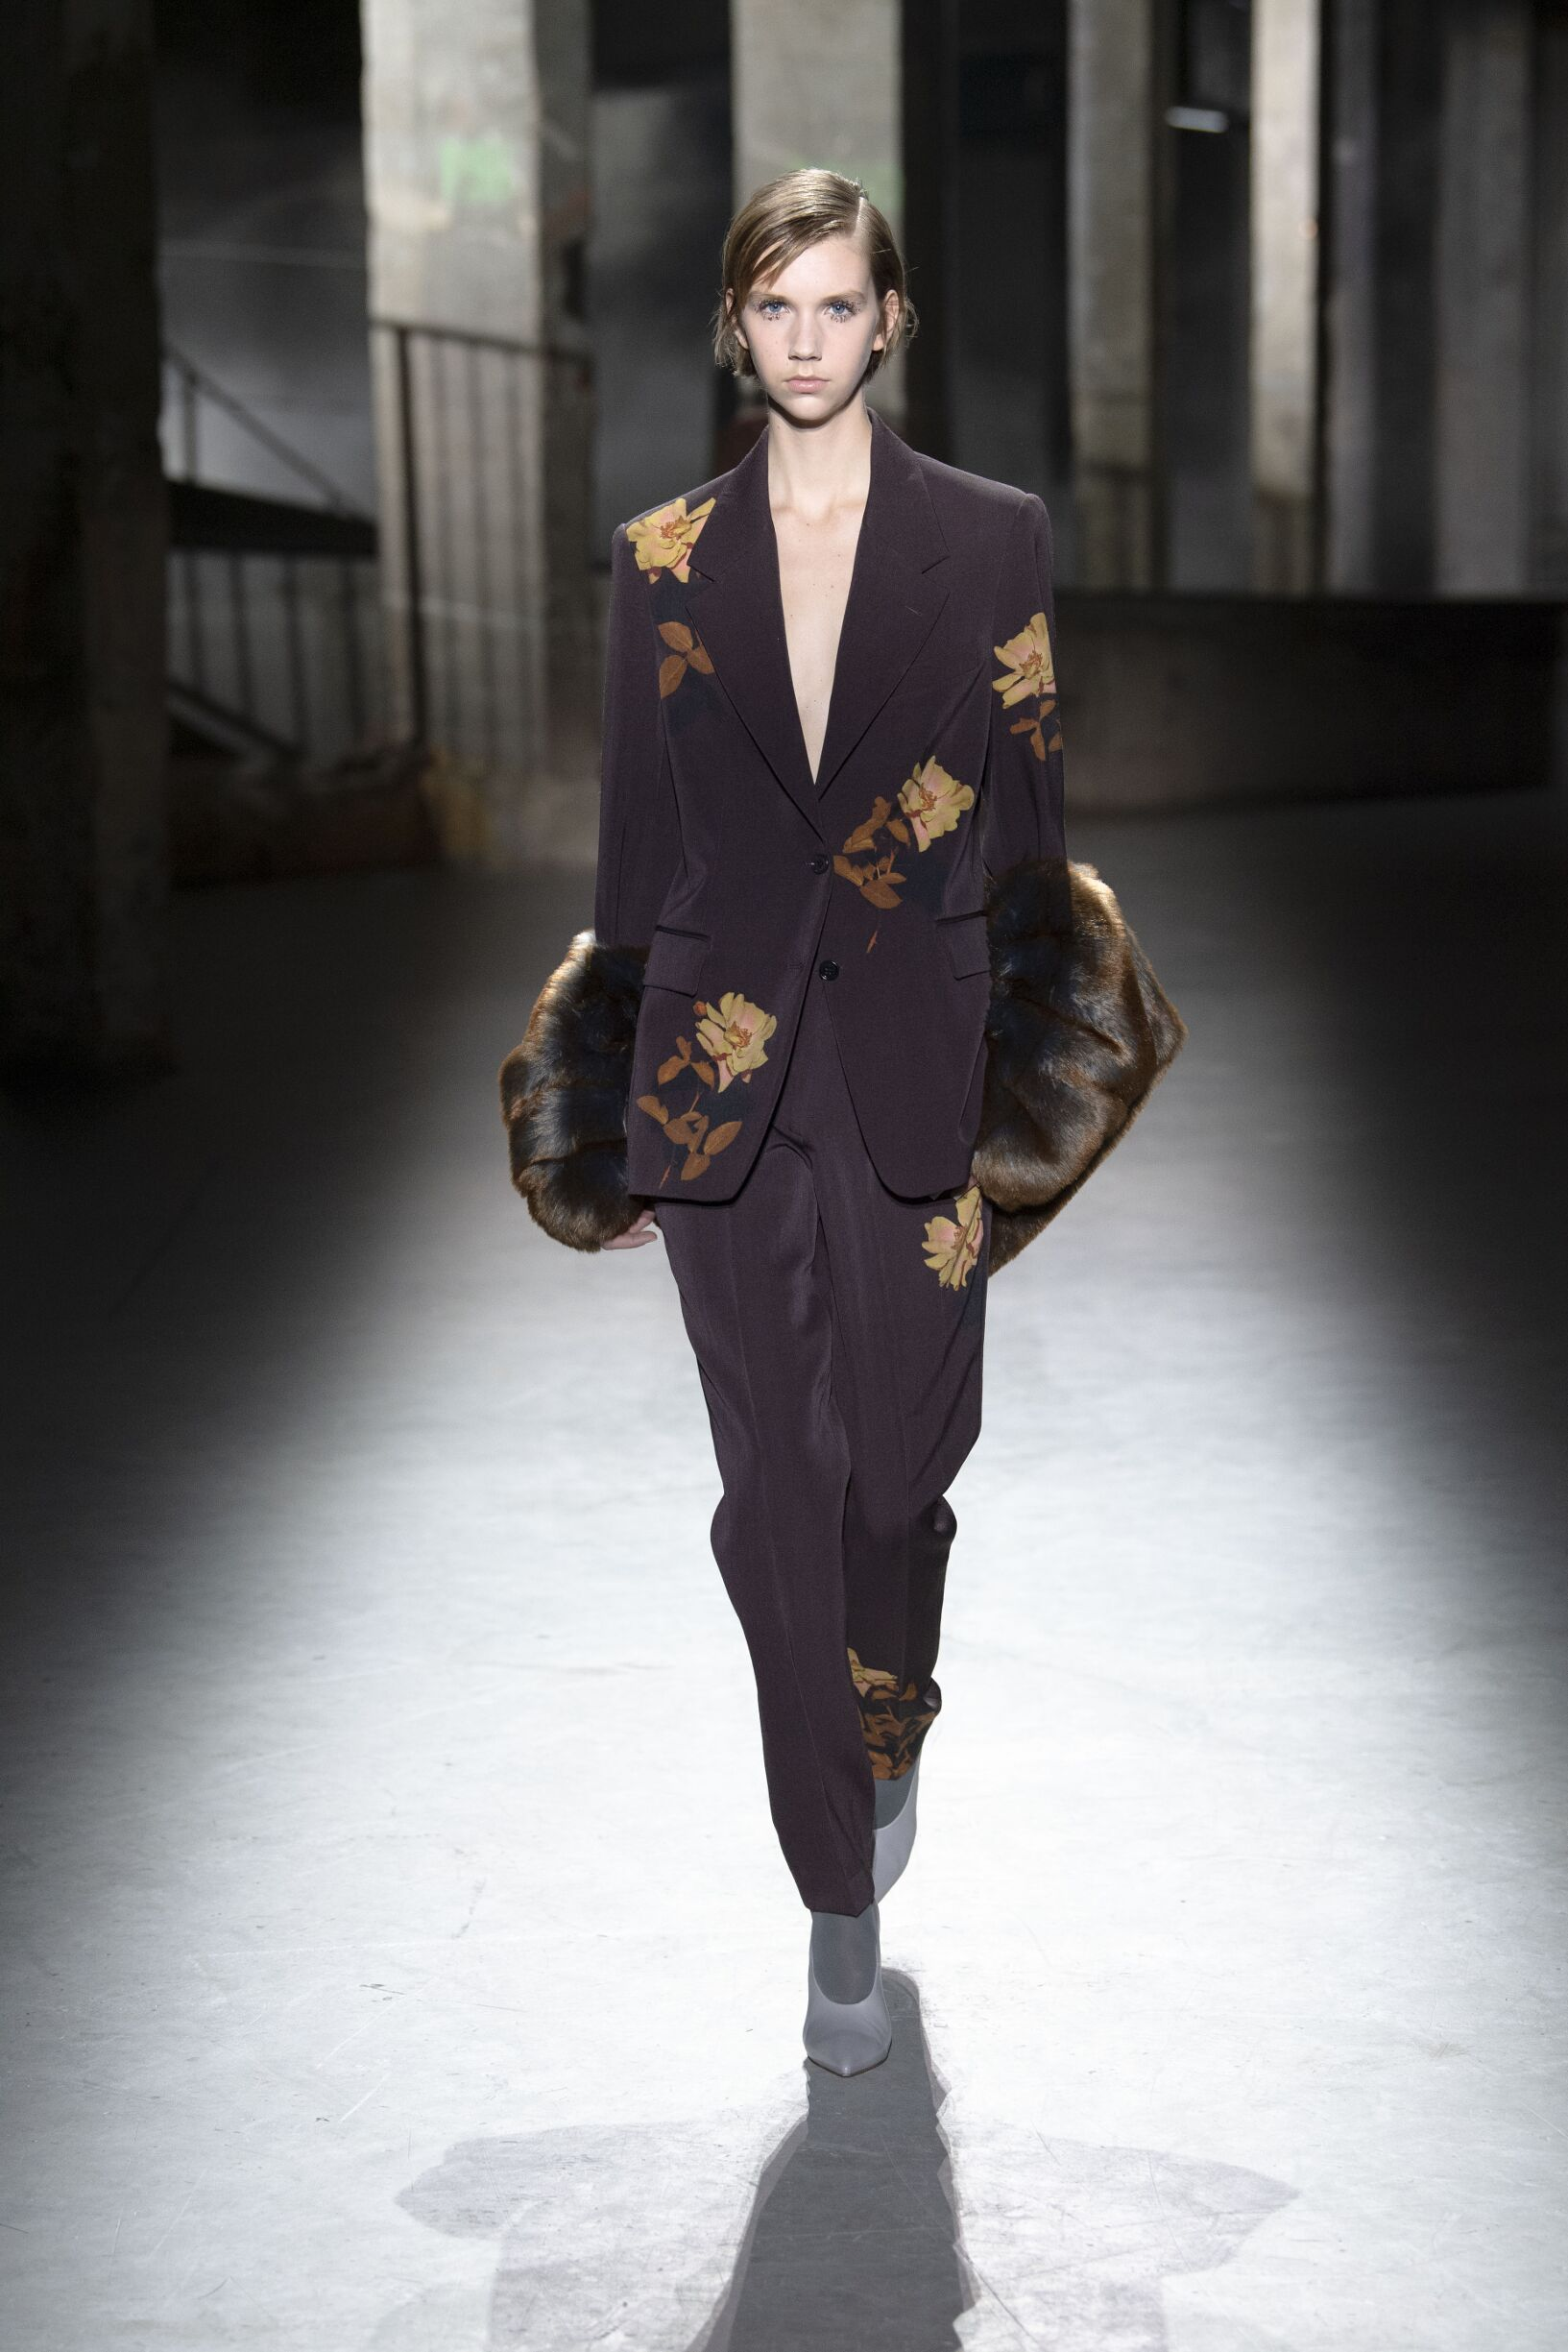 Dries van Noten Paris Fashion Week Womenswear 2019-20